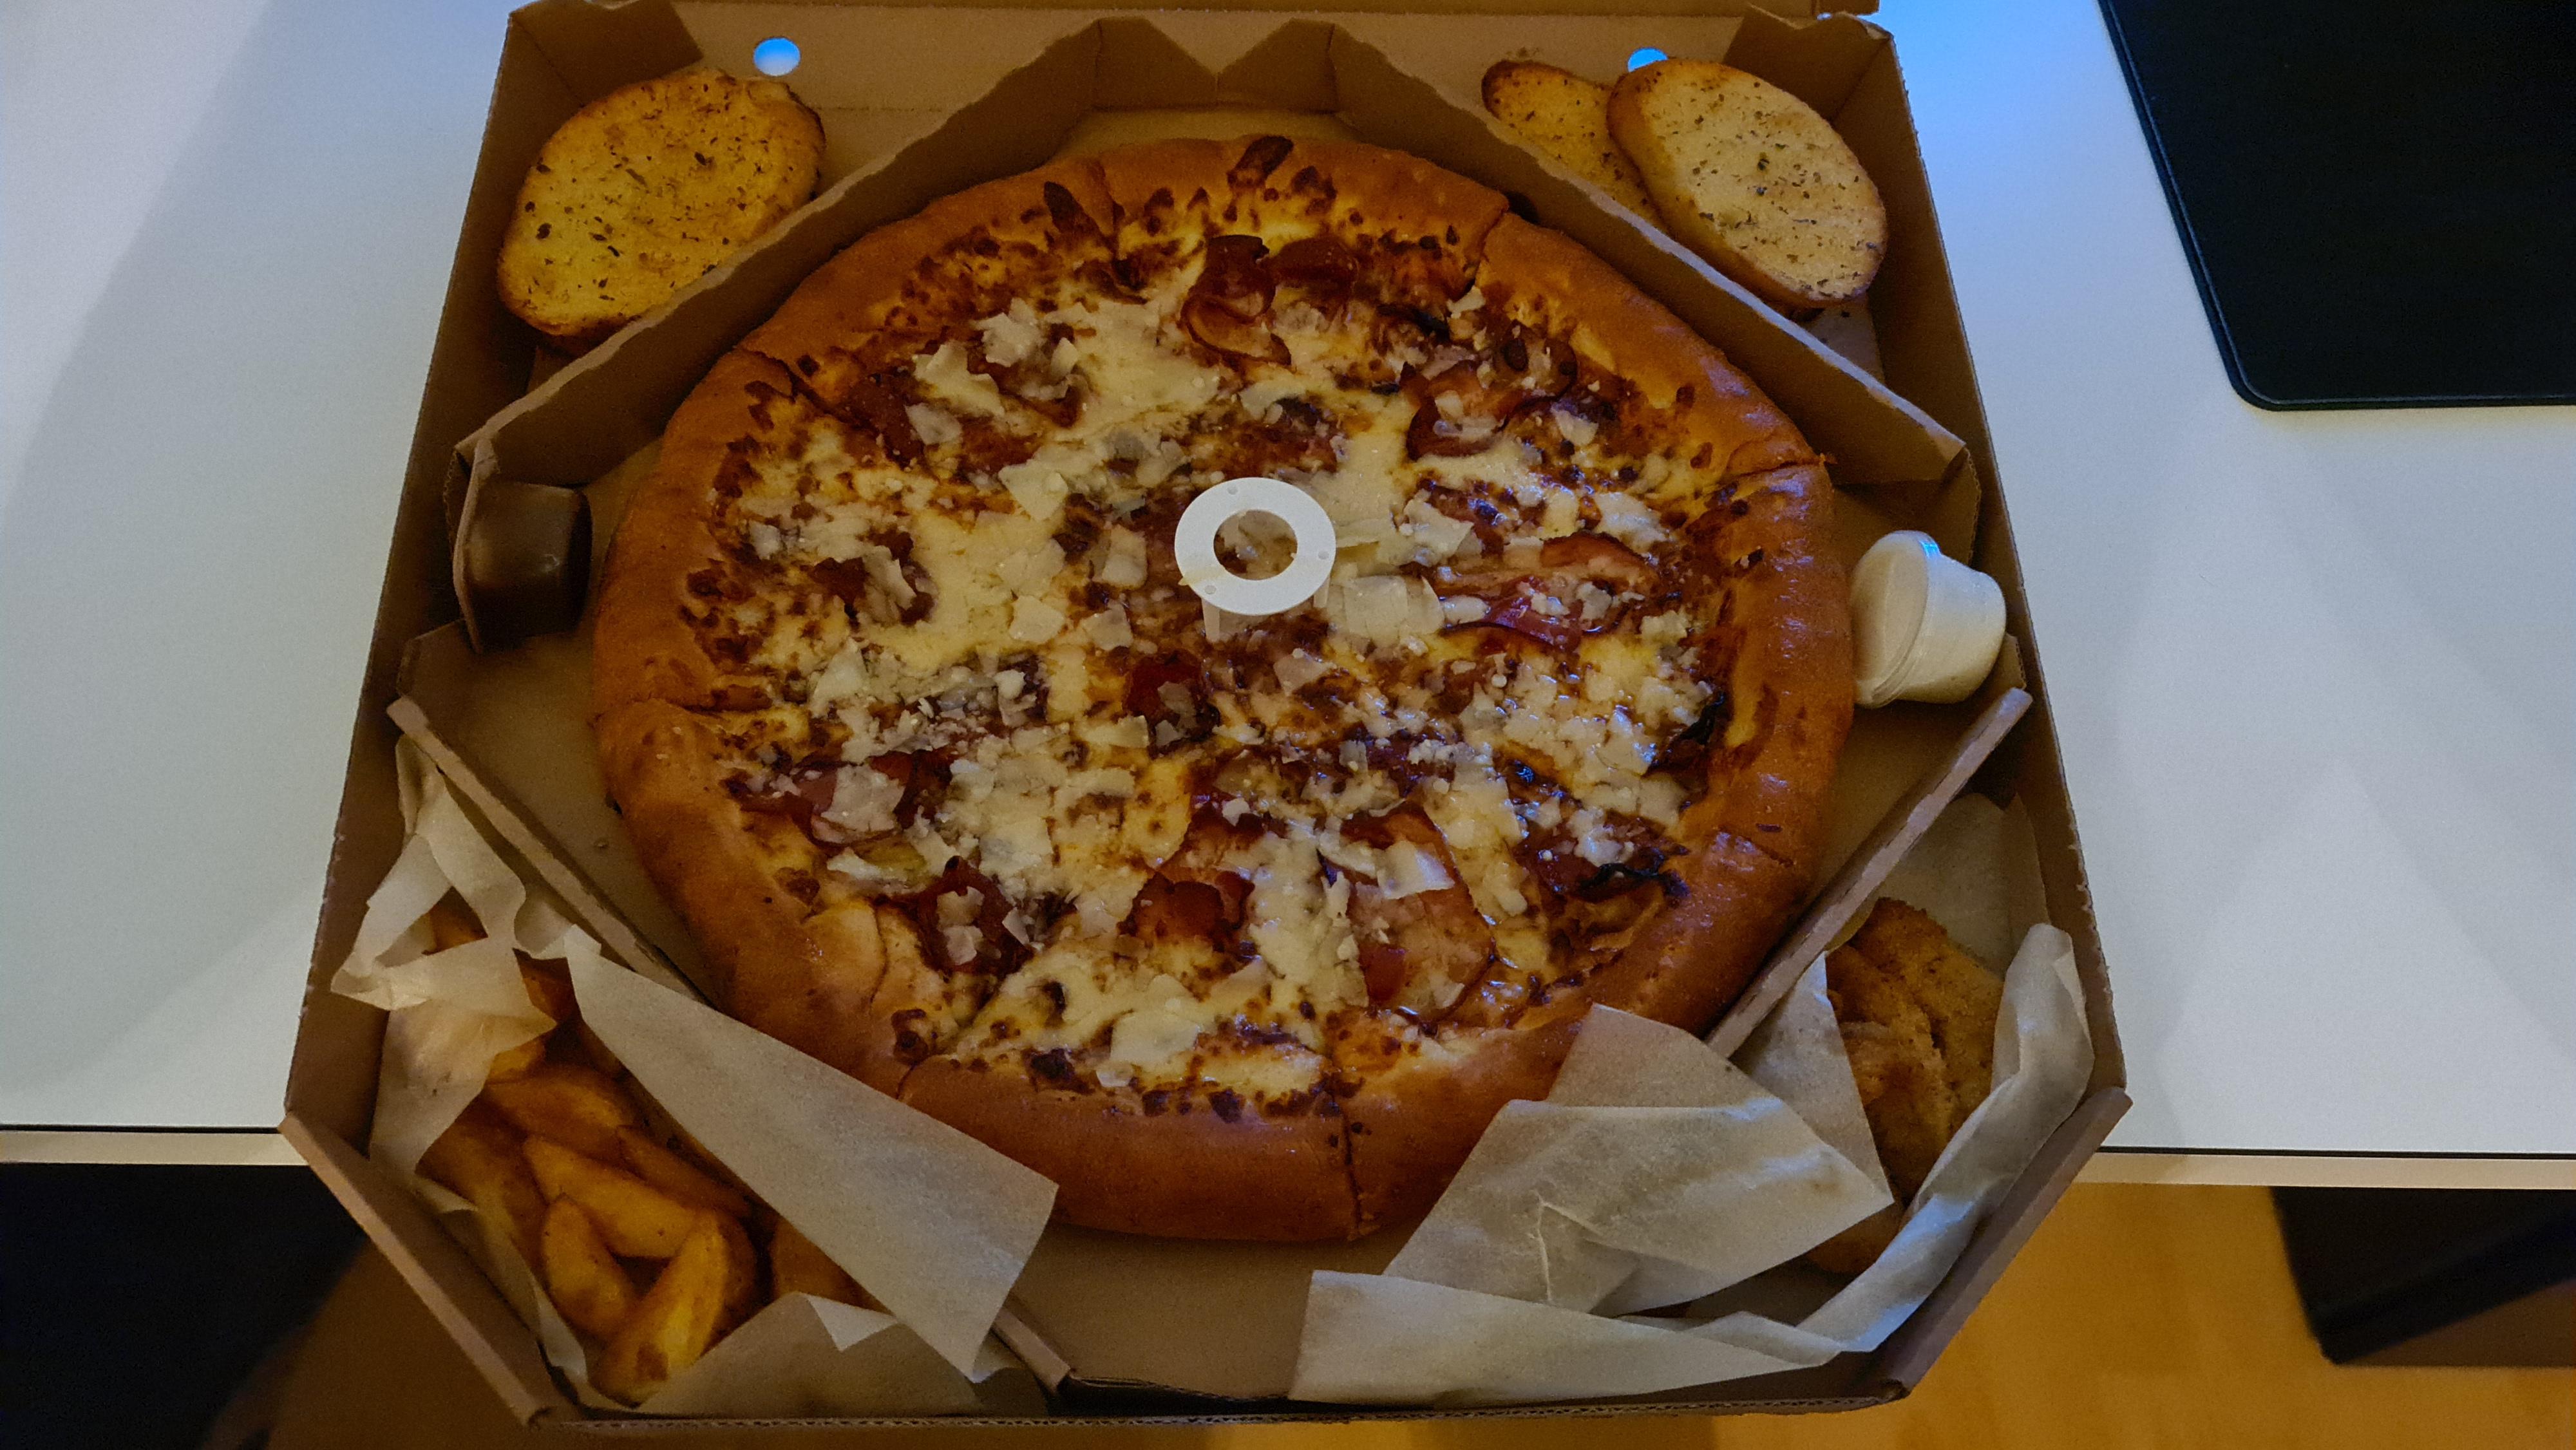 https://foodloader.net/Holz_2020-12-17_Pizza_Hut_The_Box.jpg